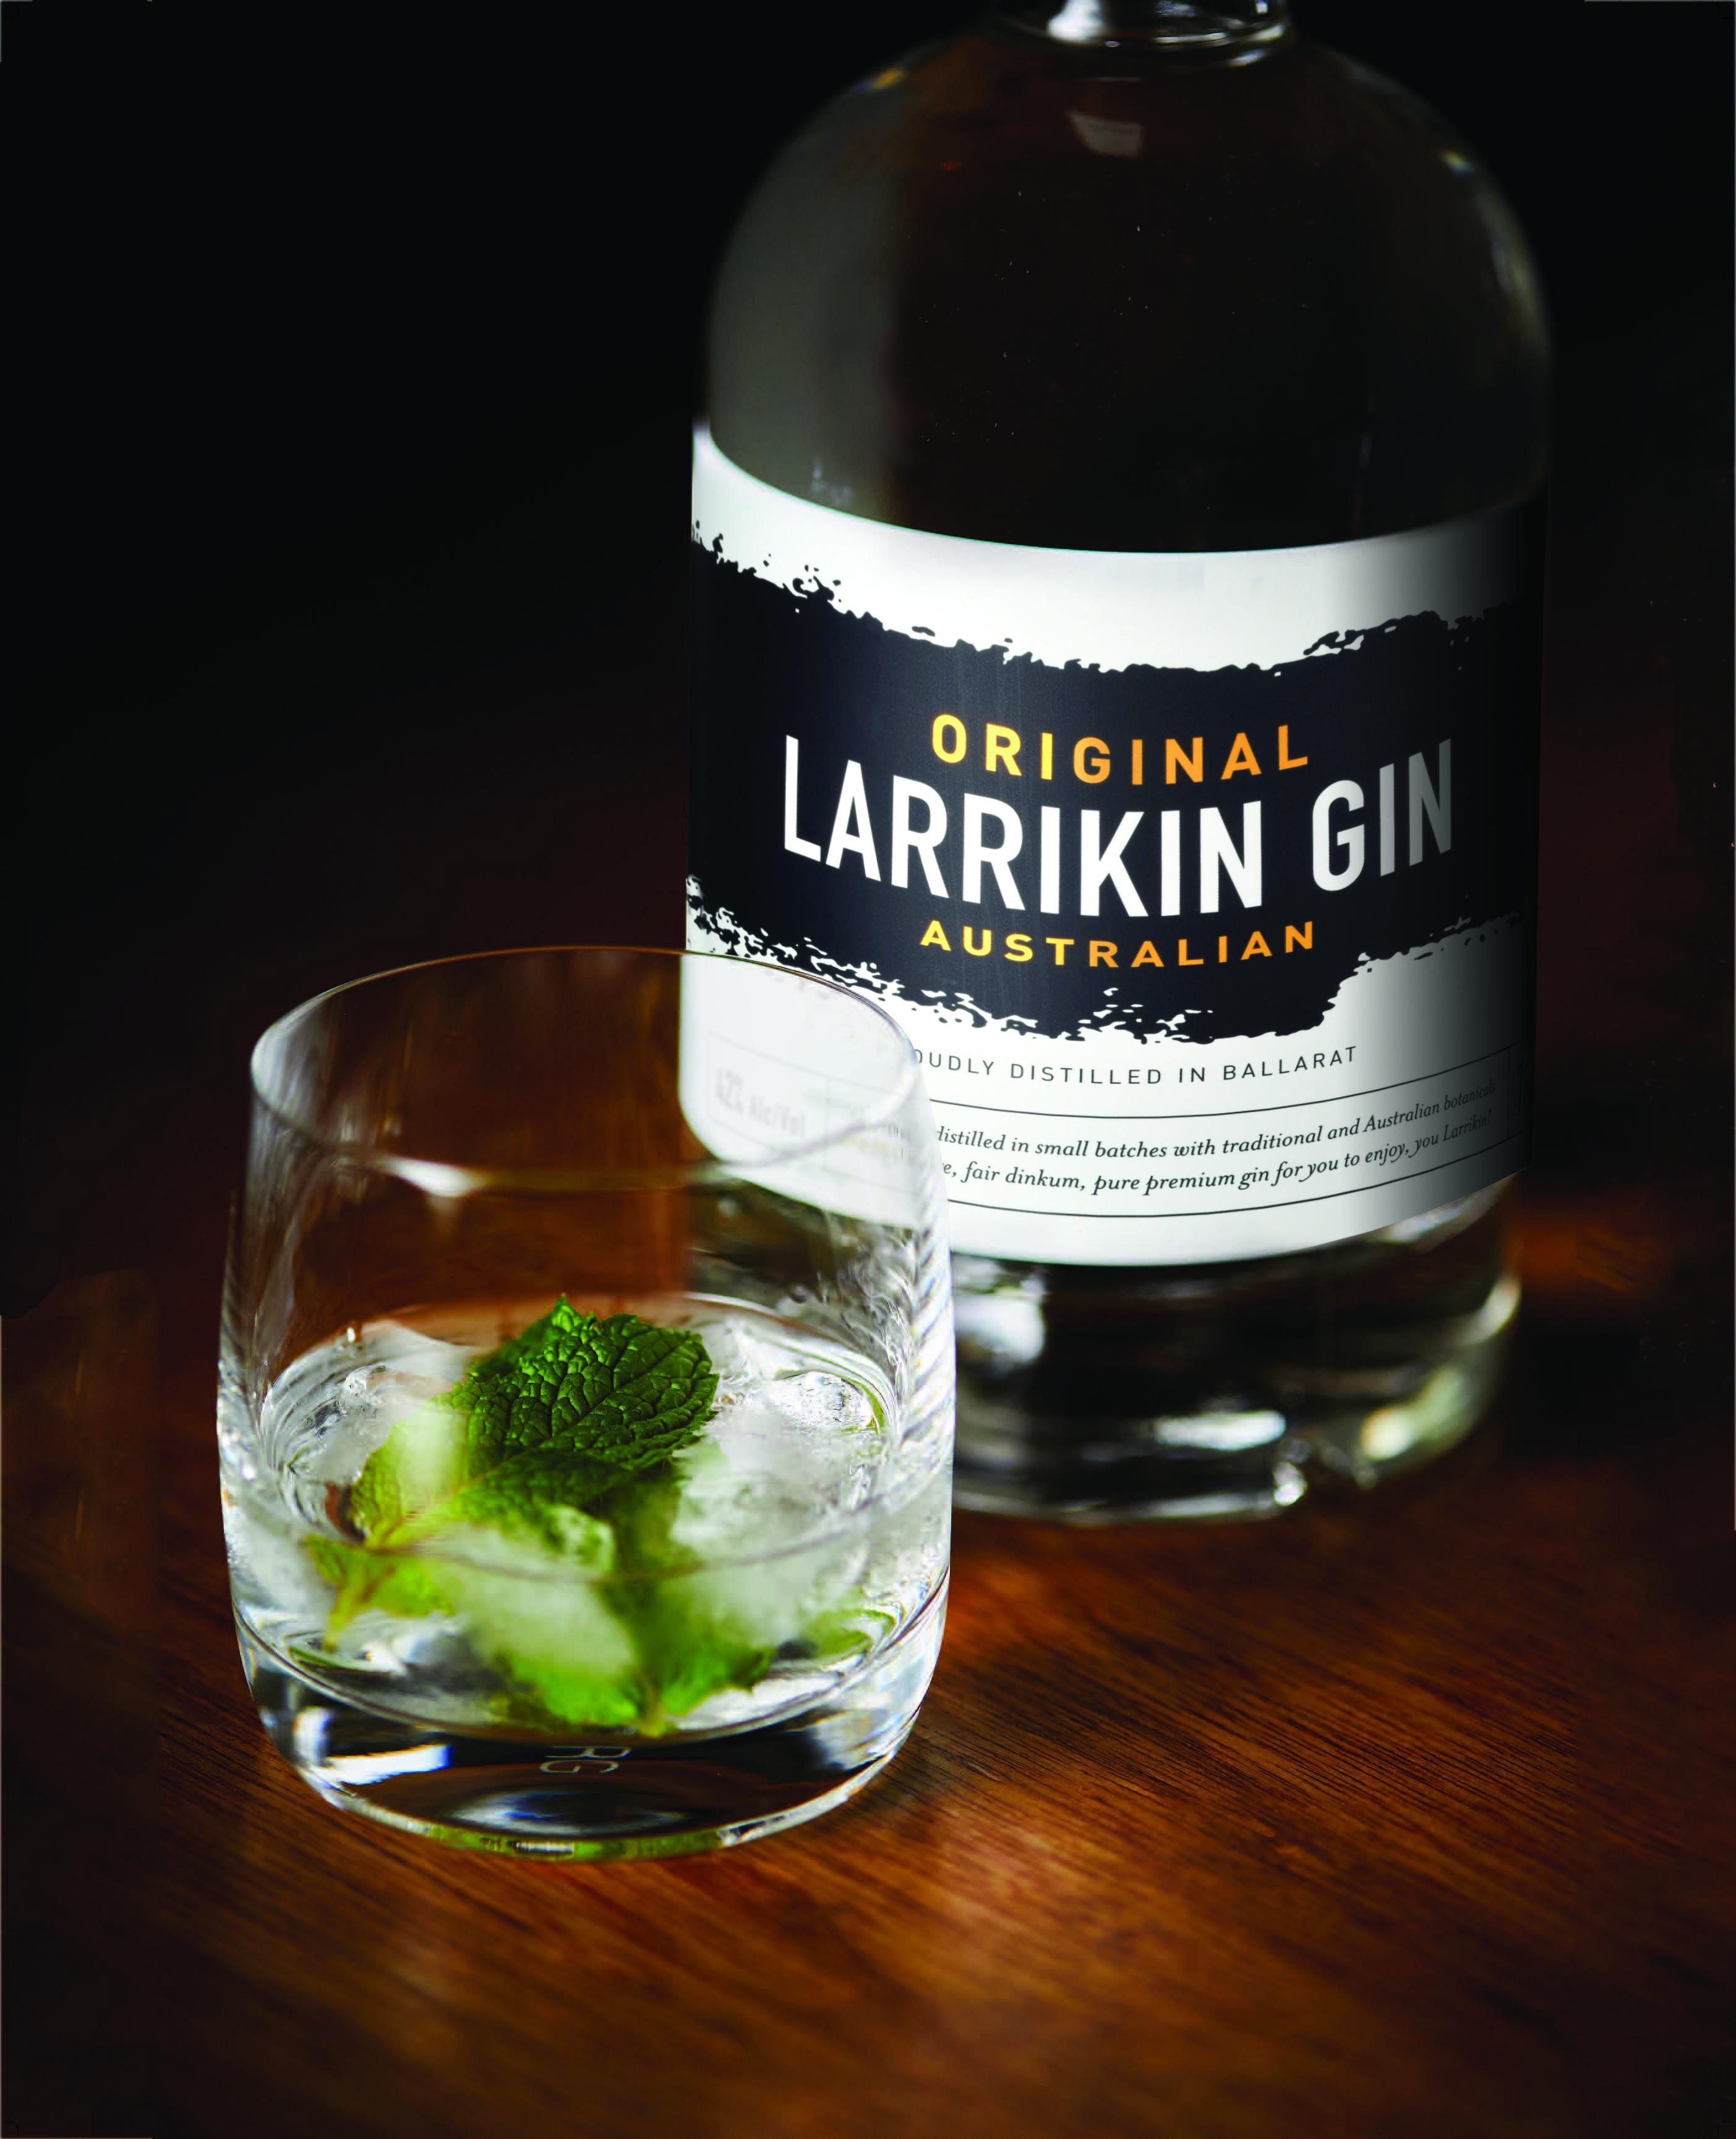 Original-Larrikin-montage